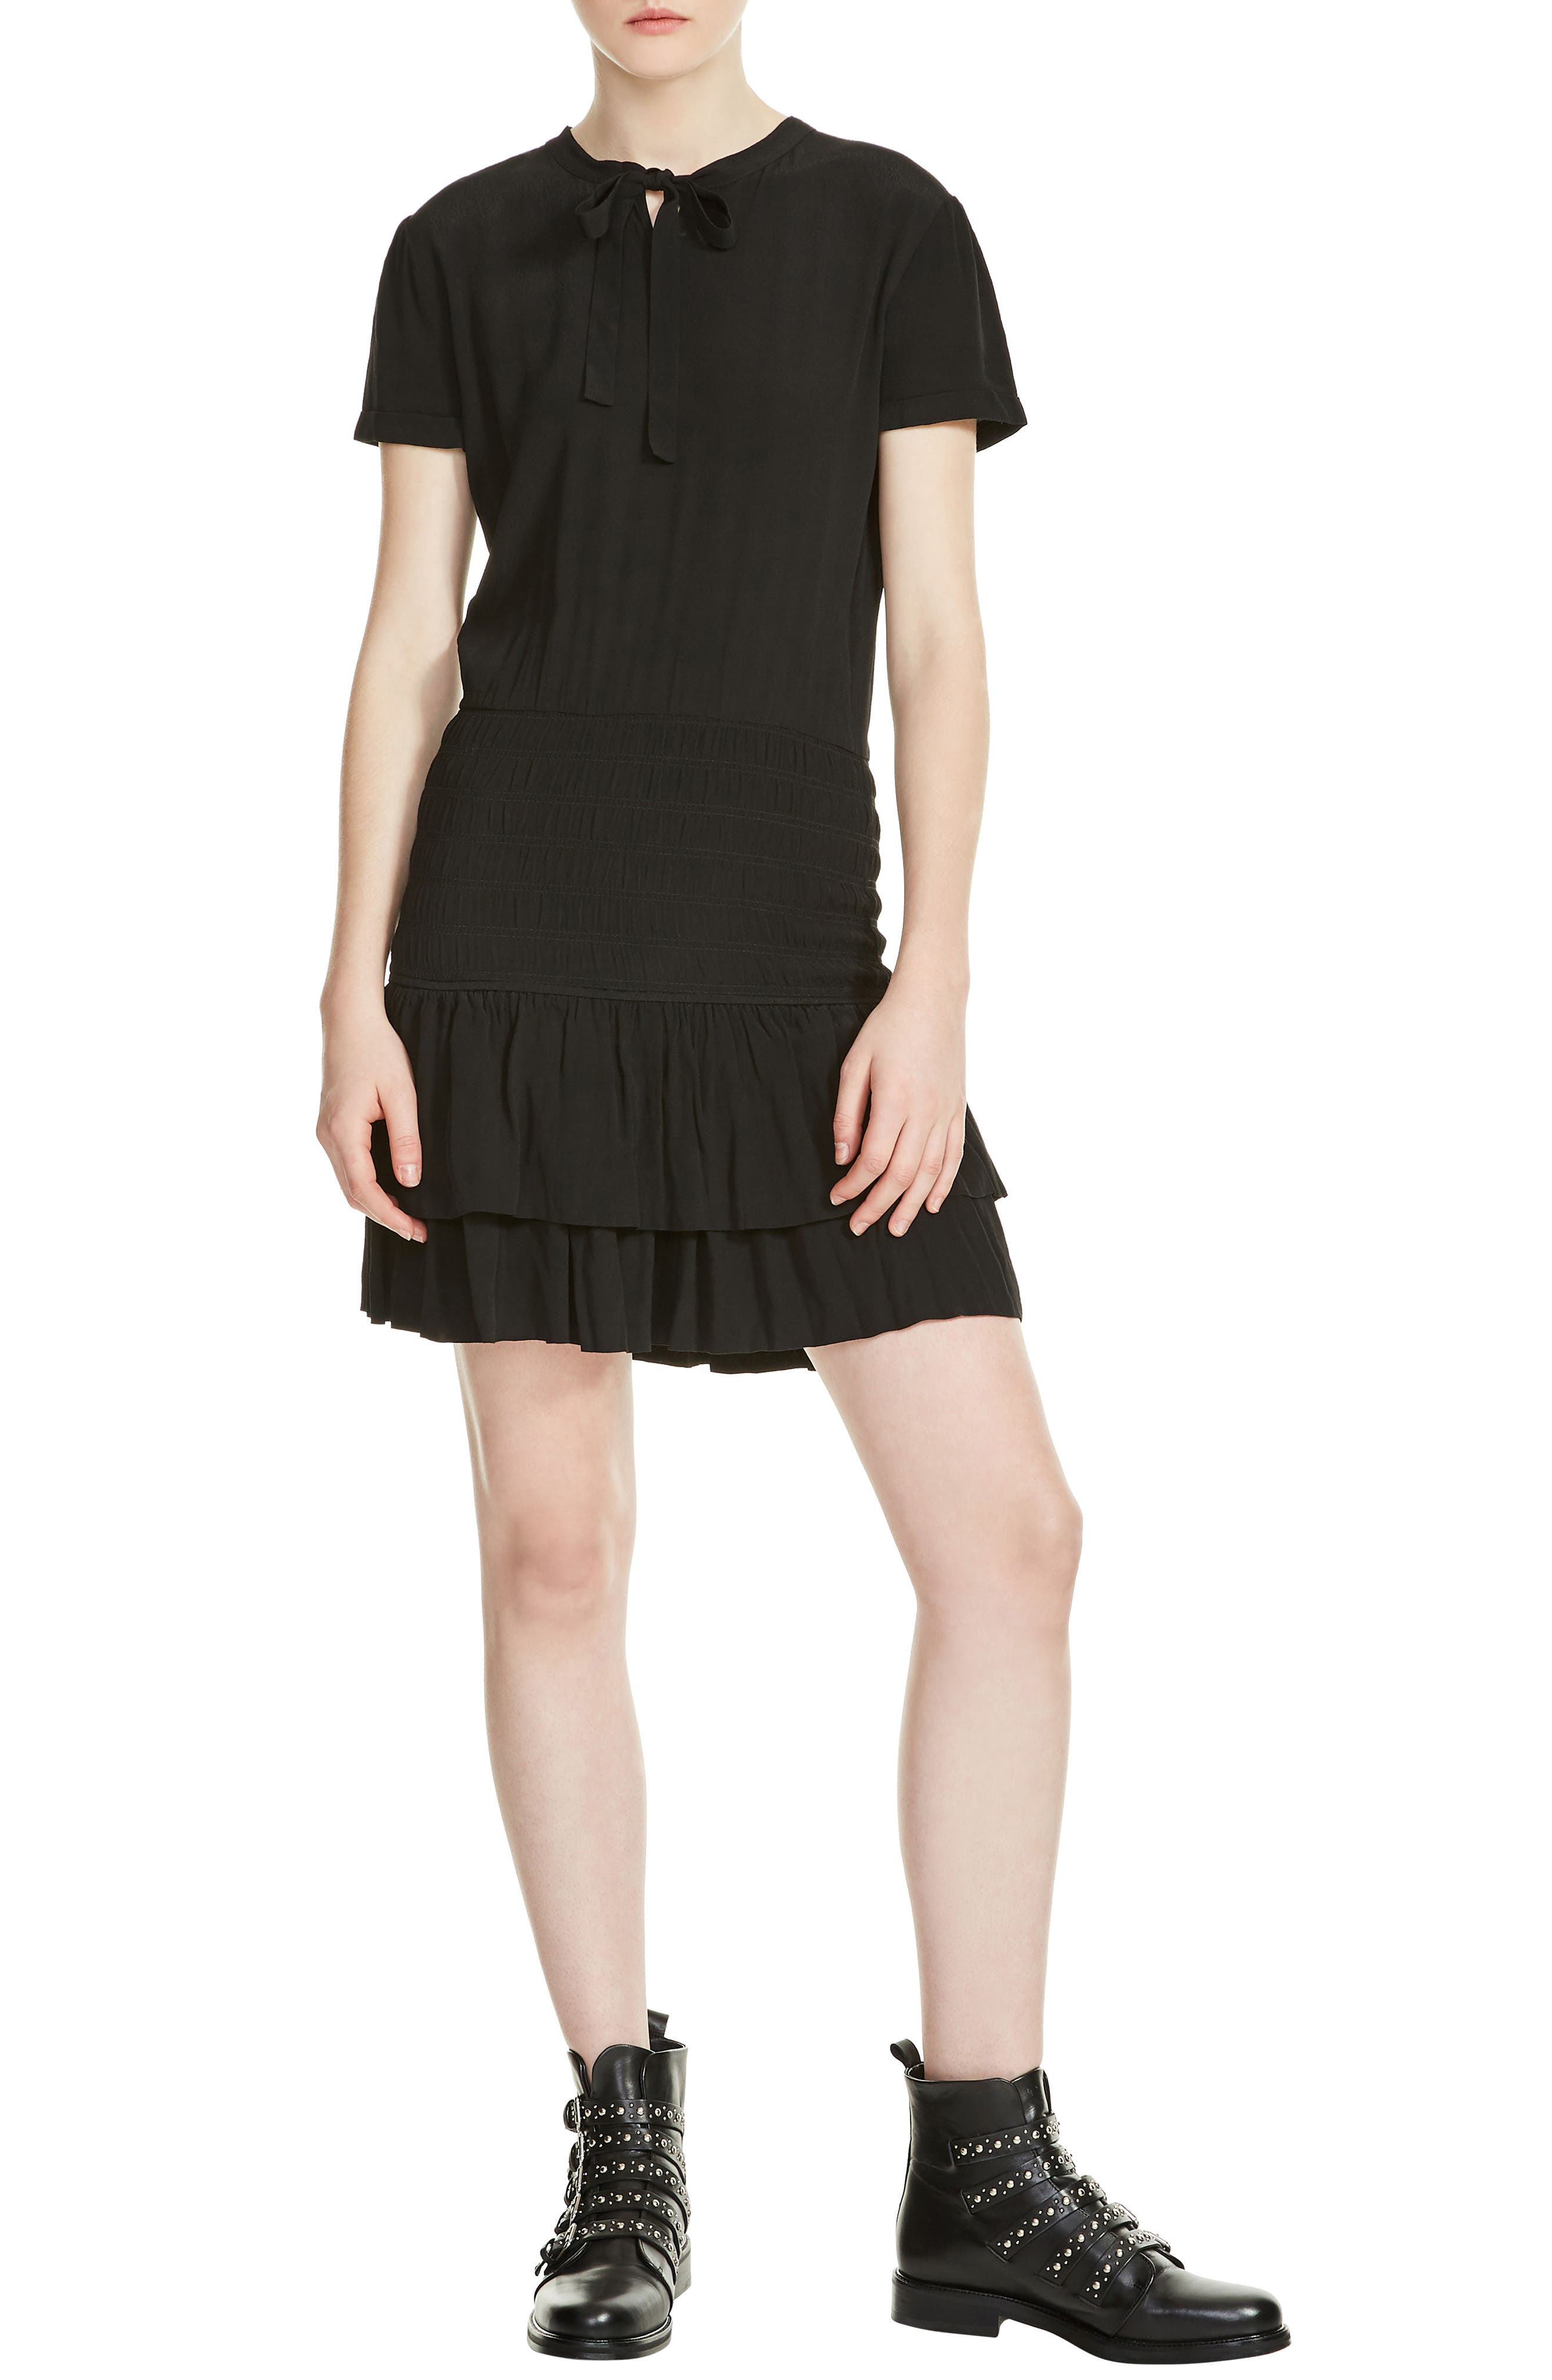 Raboa Smocked Dress,                         Main,                         color, Black